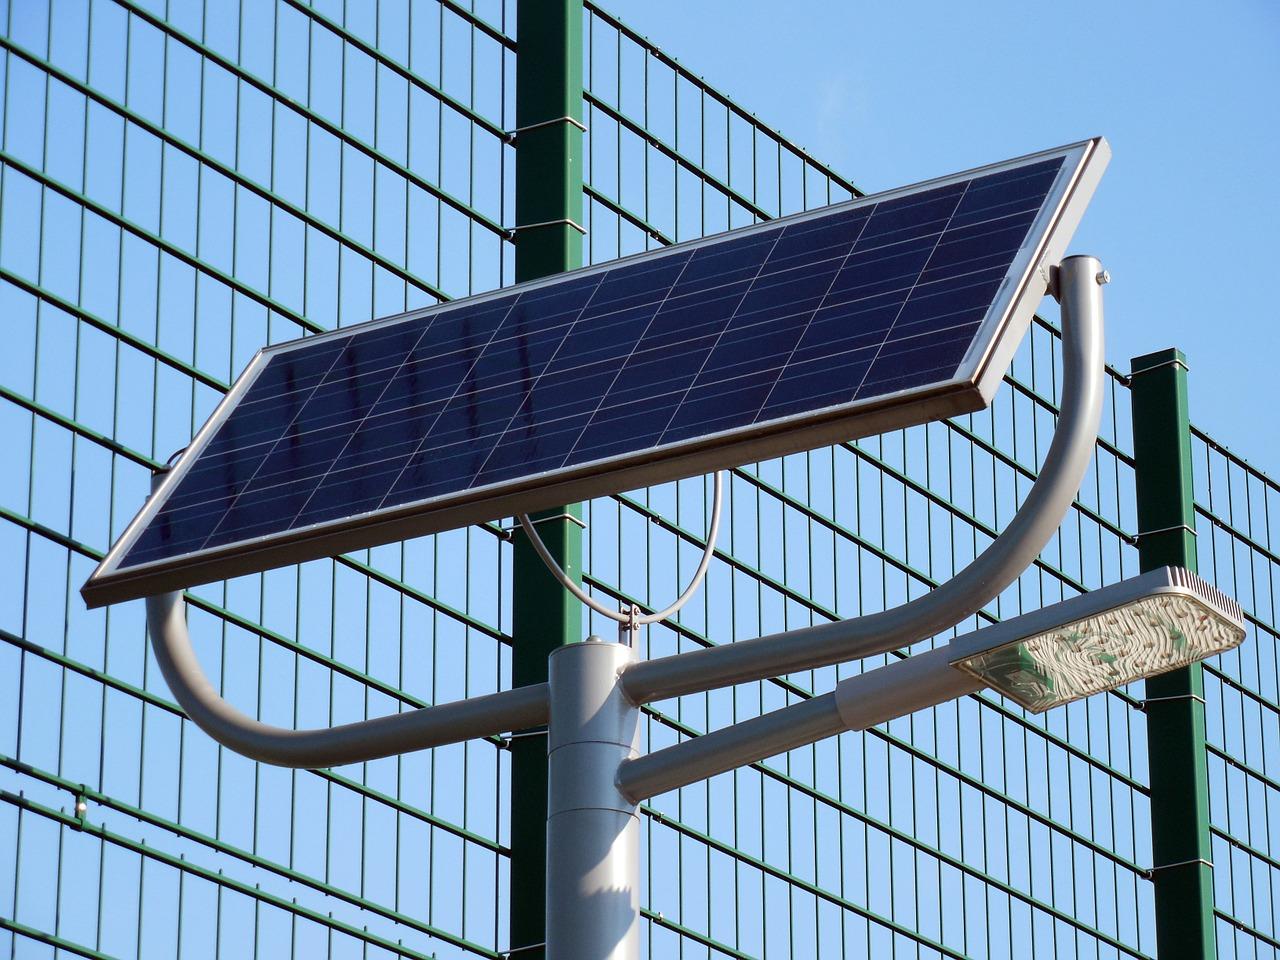 Essay souid energy call Honey Notes importance of solar energy